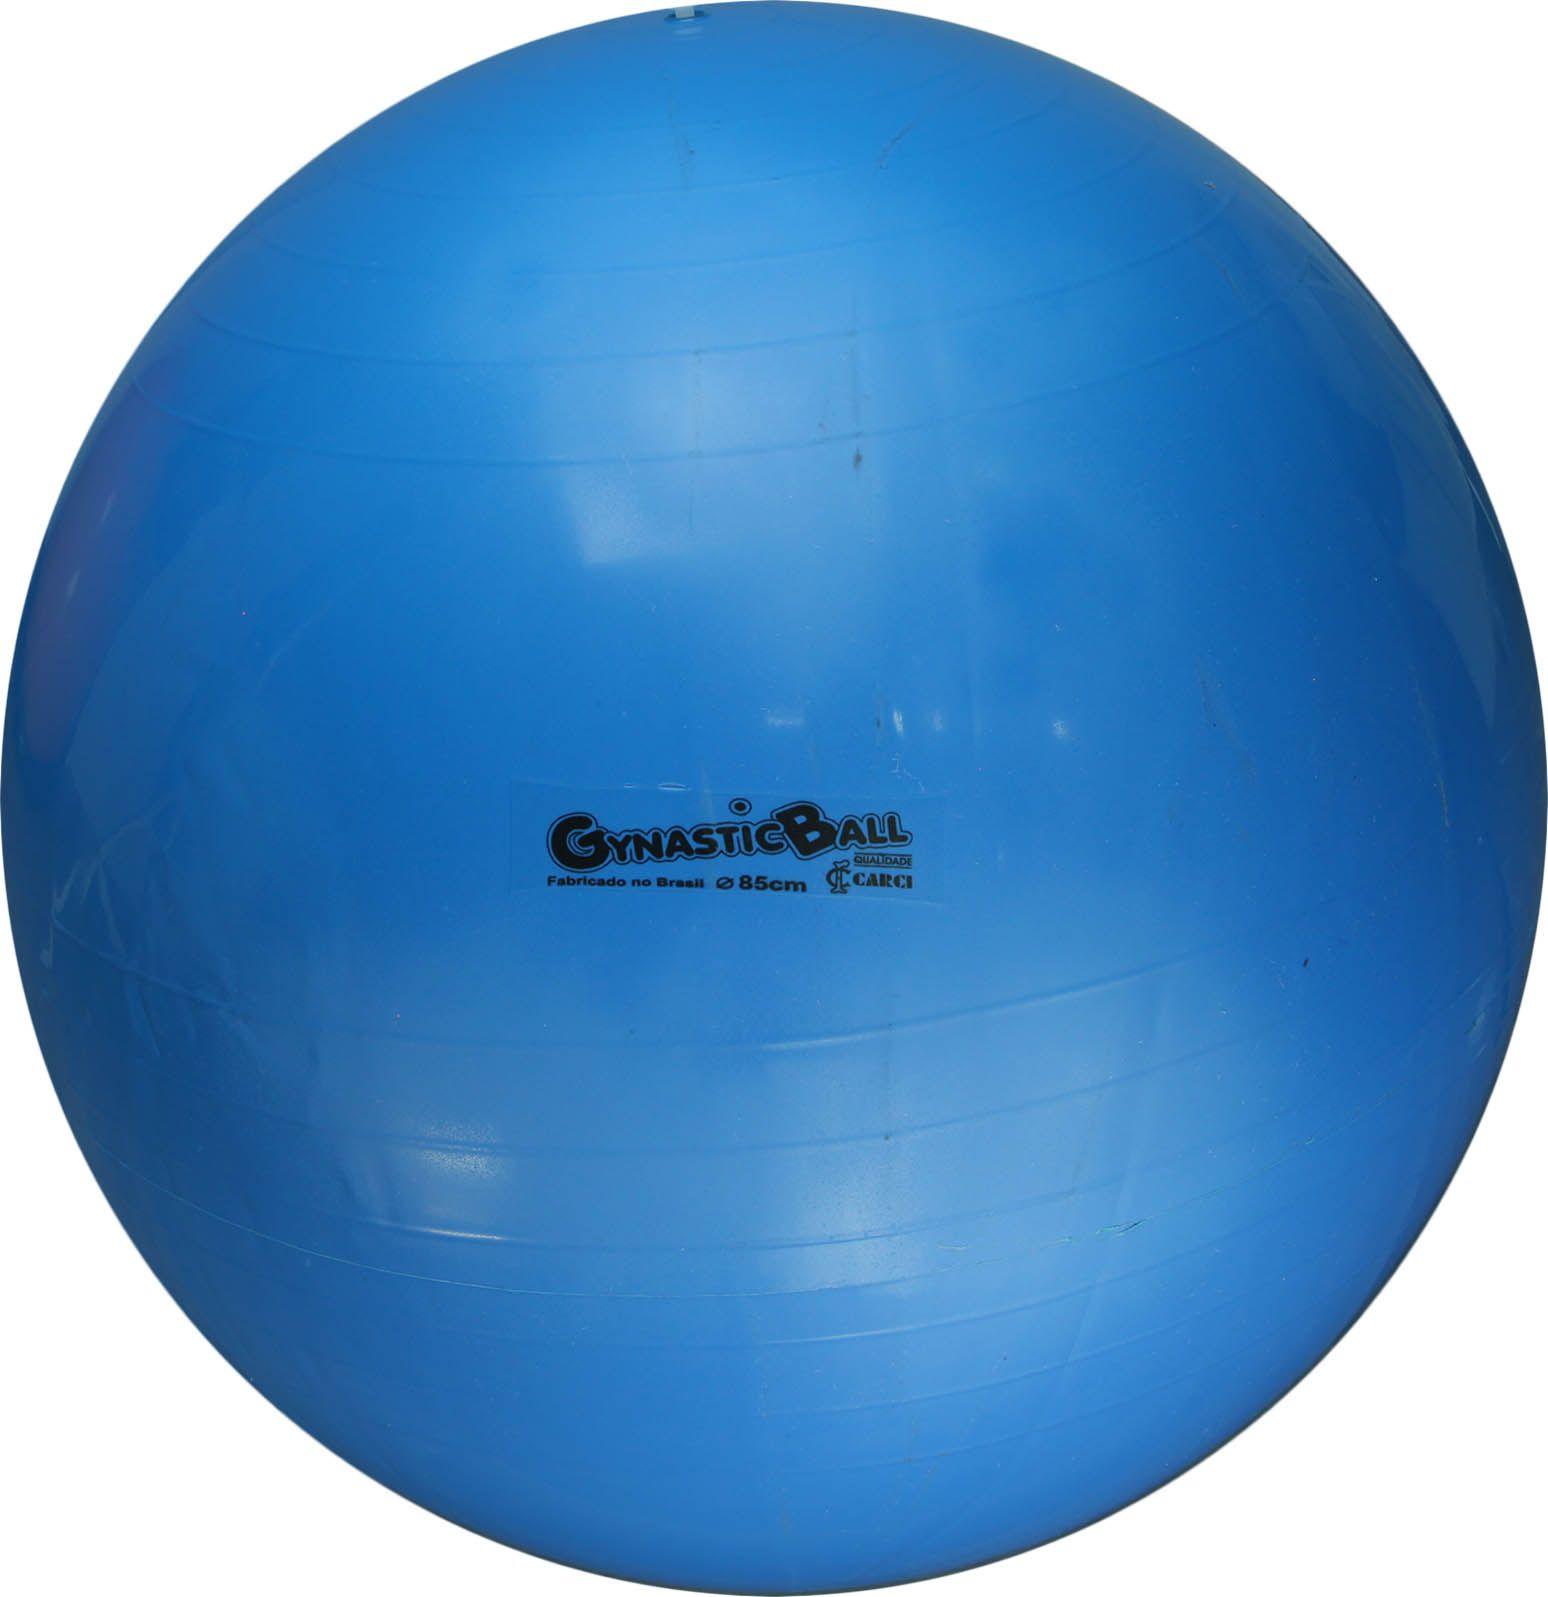 Bola suíça para pilates 85cm Gynastic Ball - azul - BL.01.85